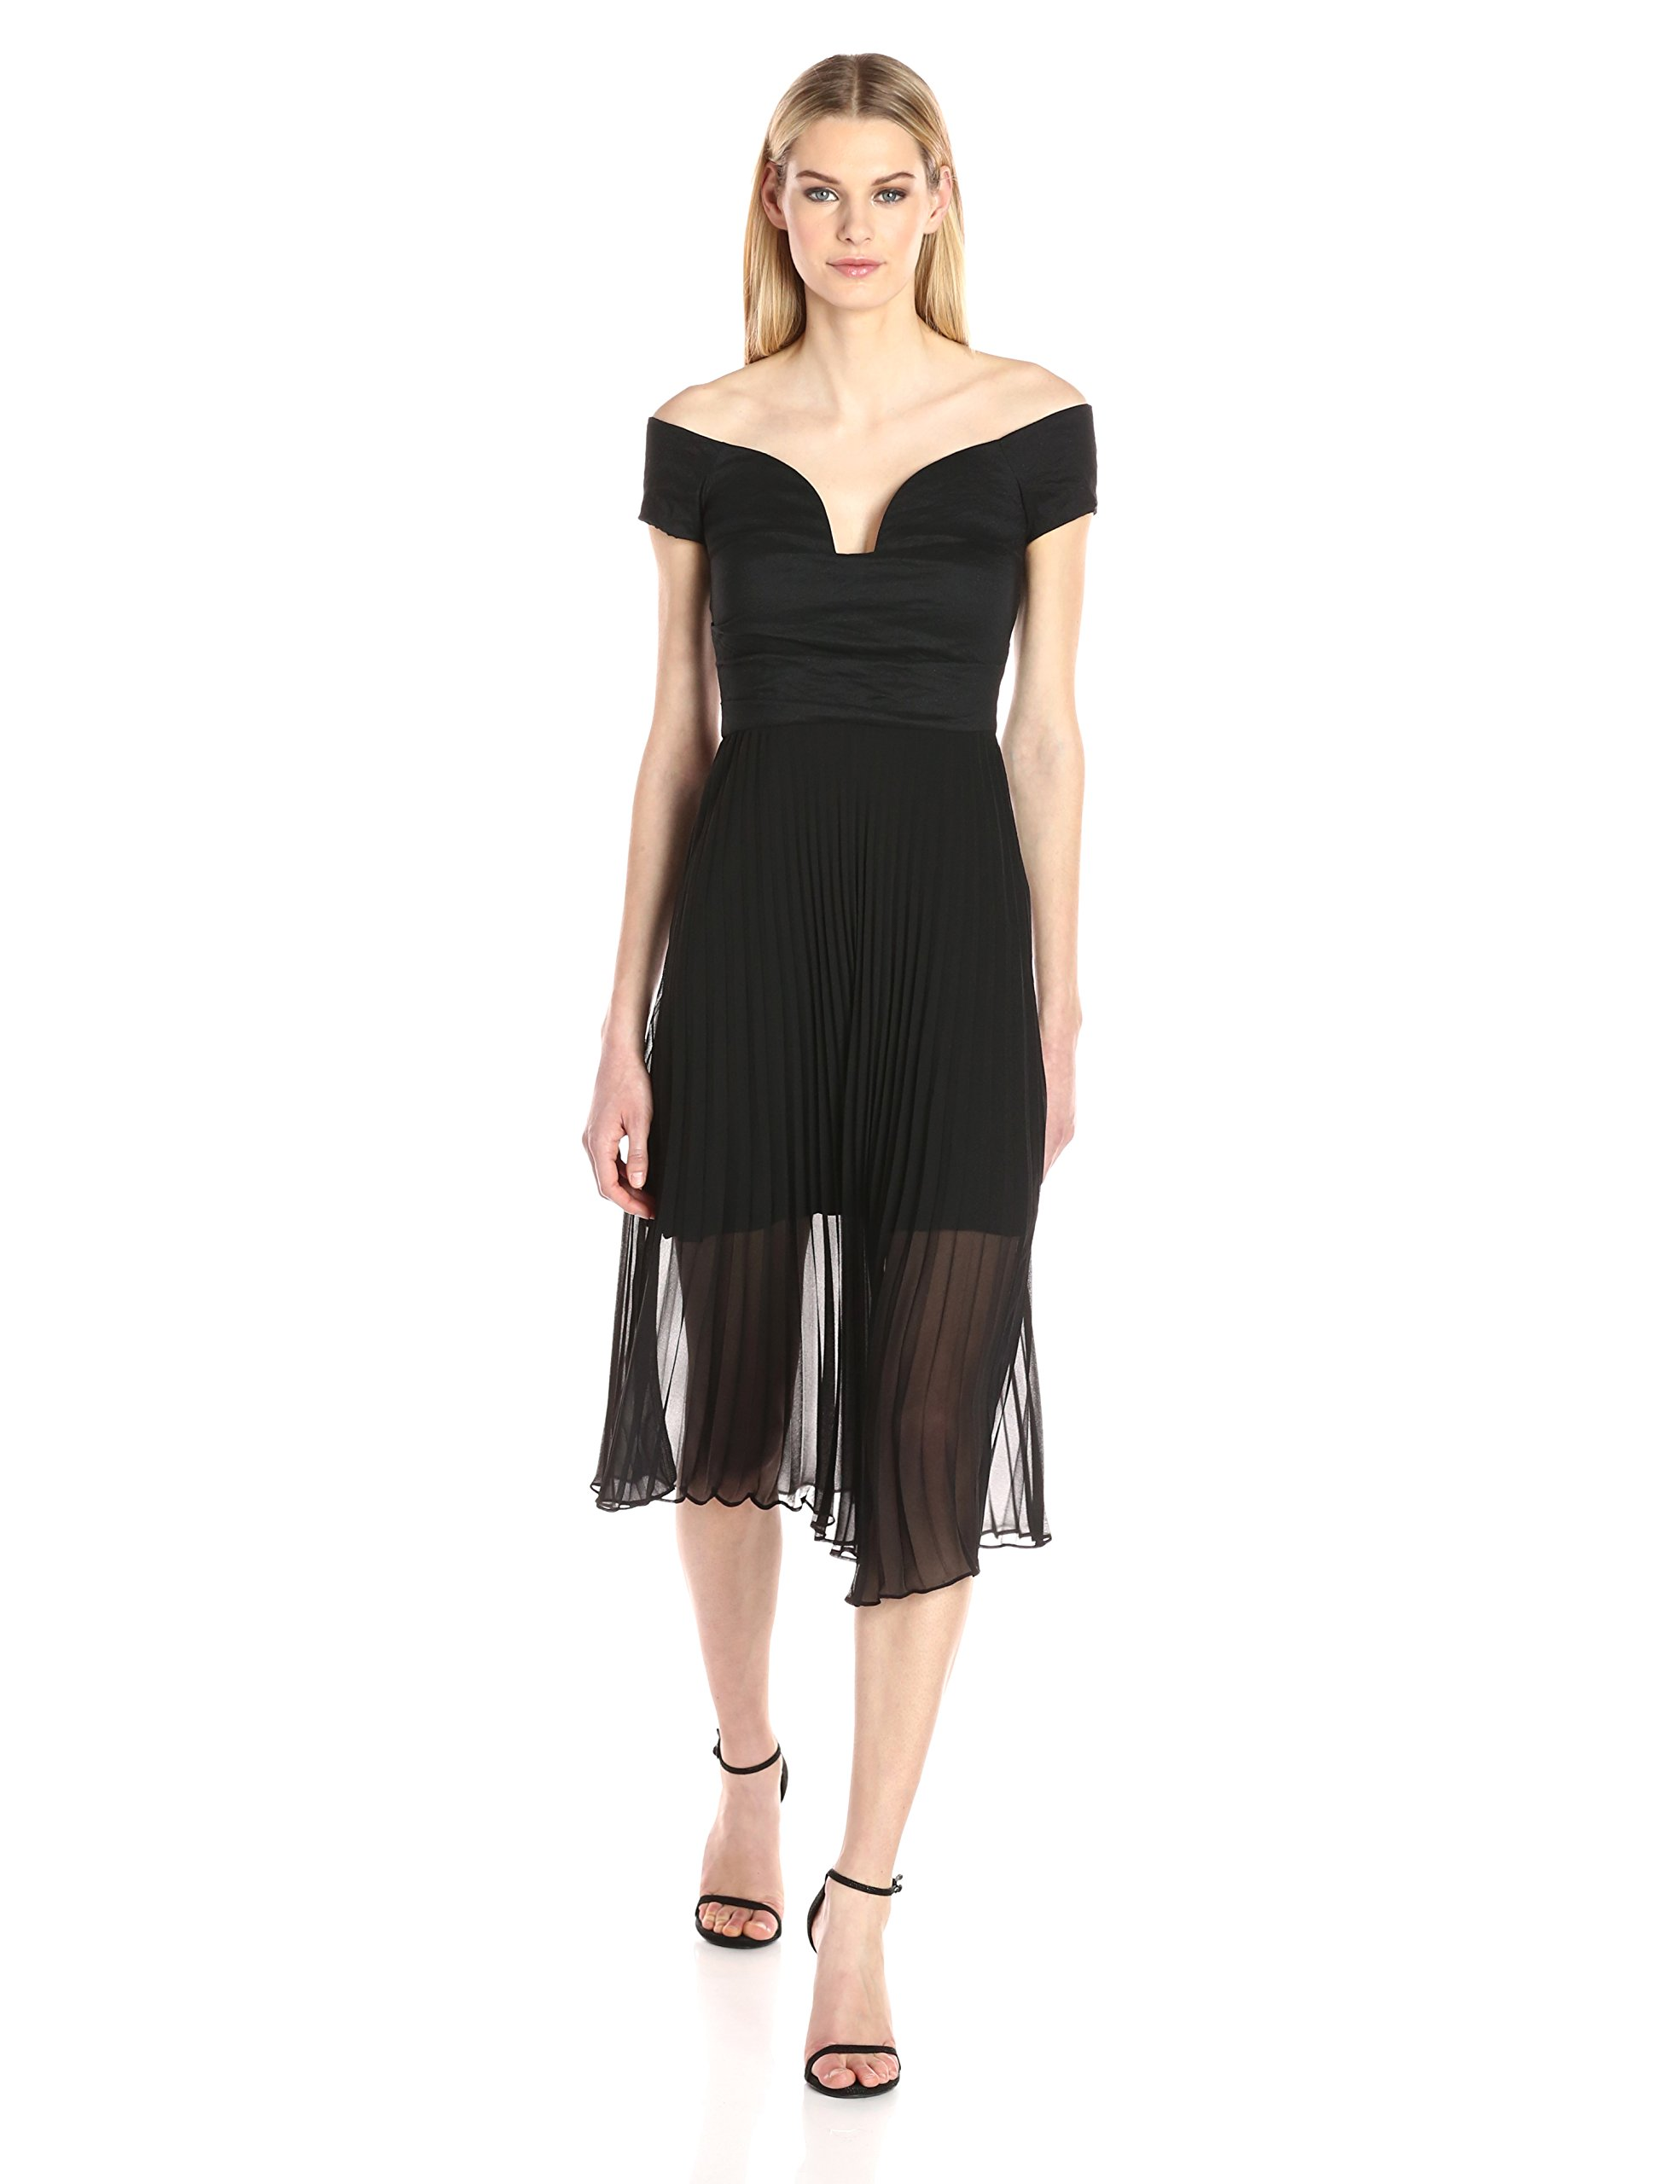 d44a3678f4cbd Fashion Designer Nicole Miller Mother of the Bride Dresses